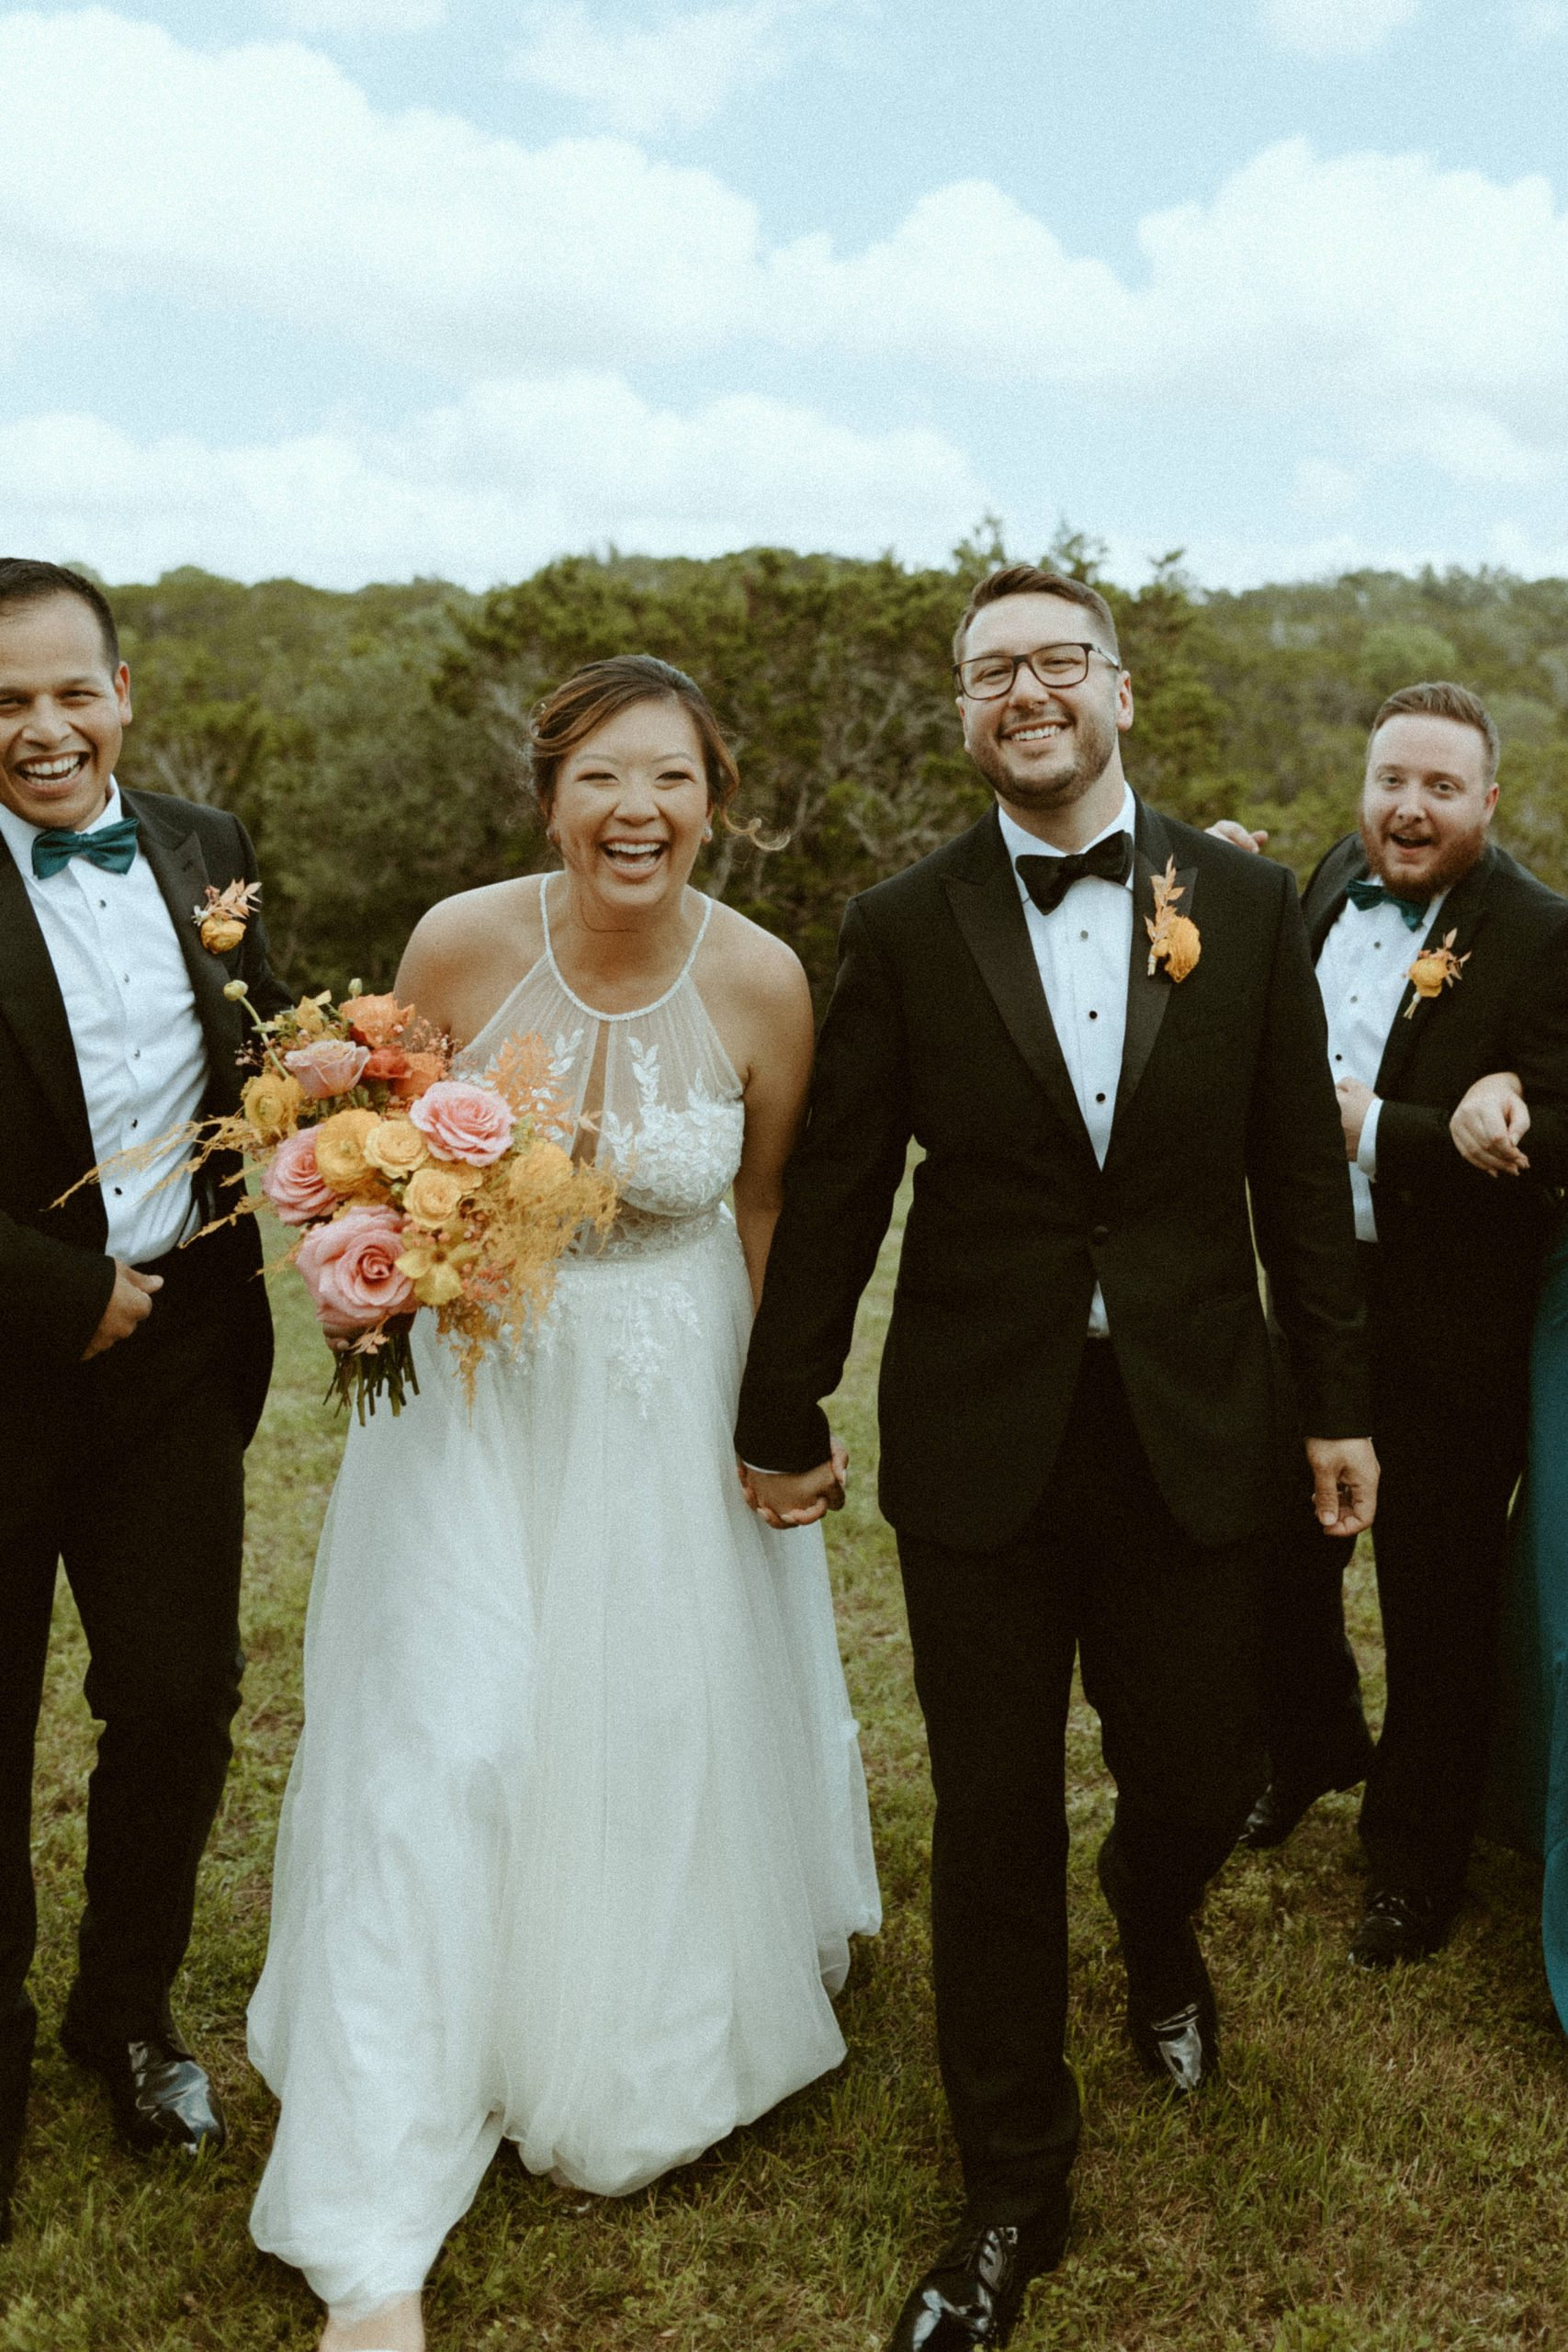 Hill Country Wedding, Hill Country Wedding Photographer, Austin Wedding, Austin Wedding Photographer, Texas Wedding Photographer, Dallas Wedding, Dallas Wedding Photographer, Austin Wedding,